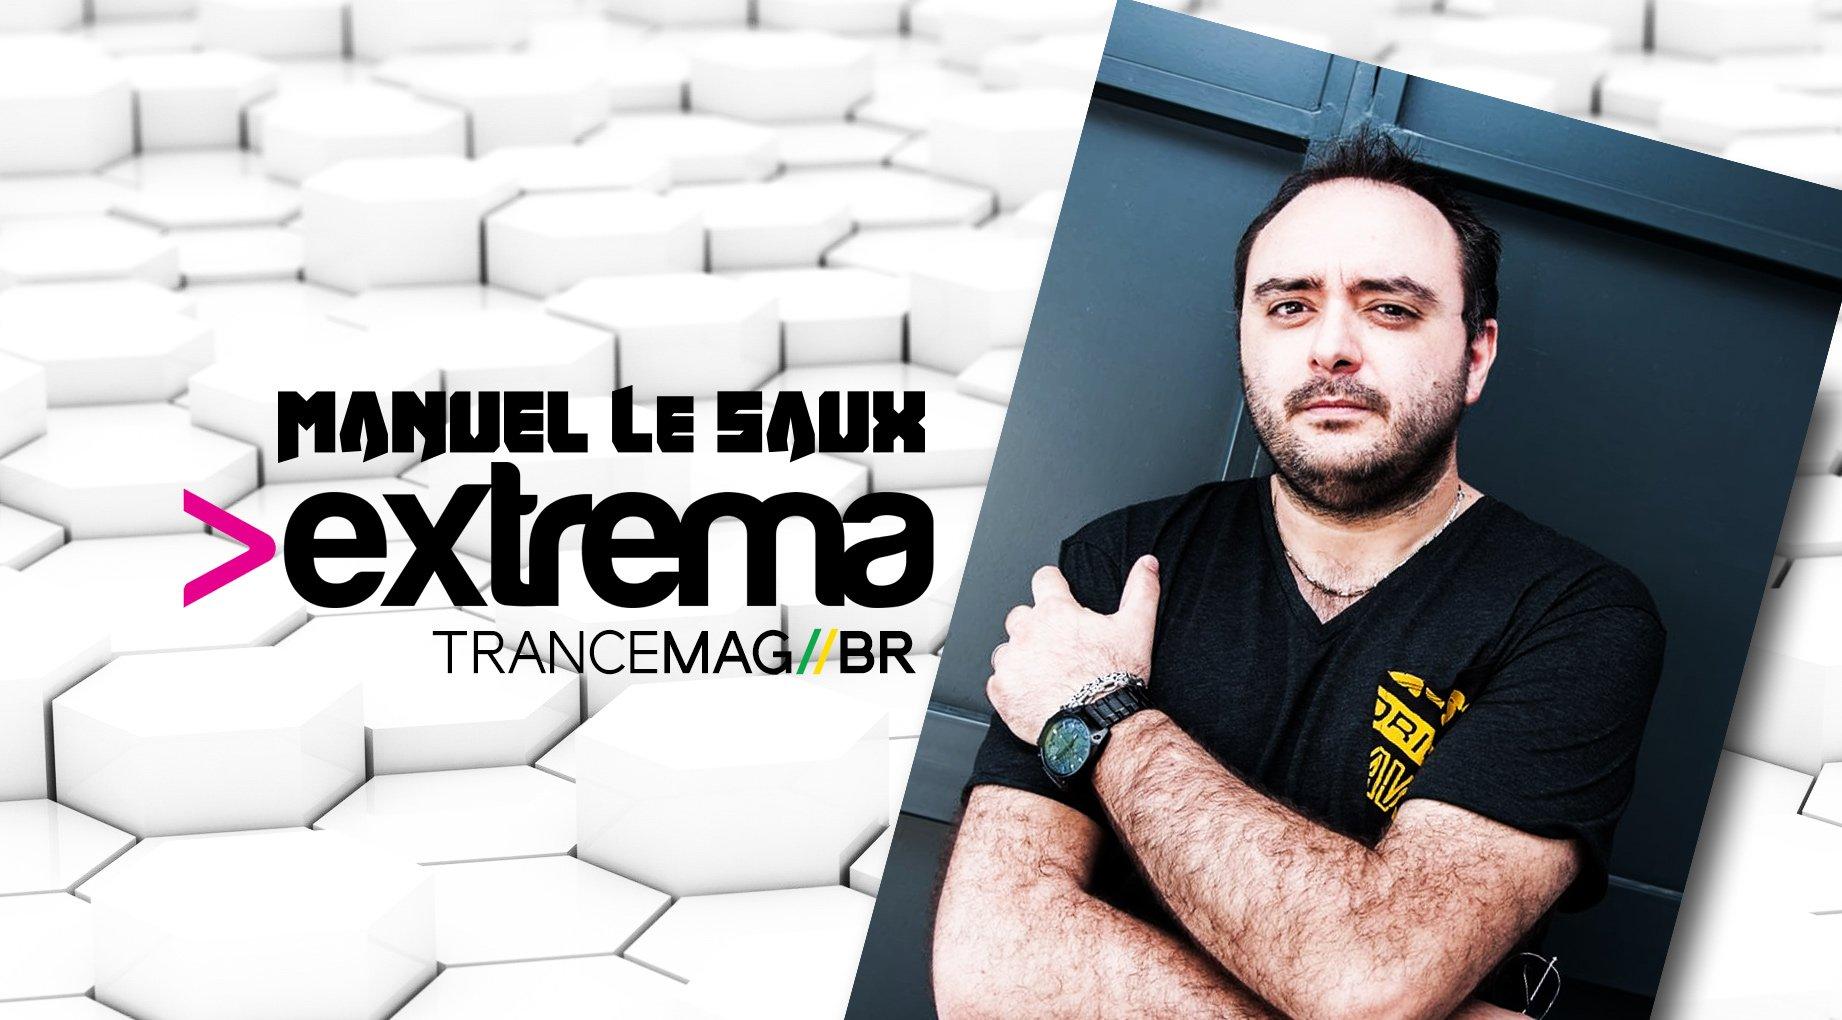 Manuel Le Saux apresenta EXTREMA 462 // TRANCEMAG//BR